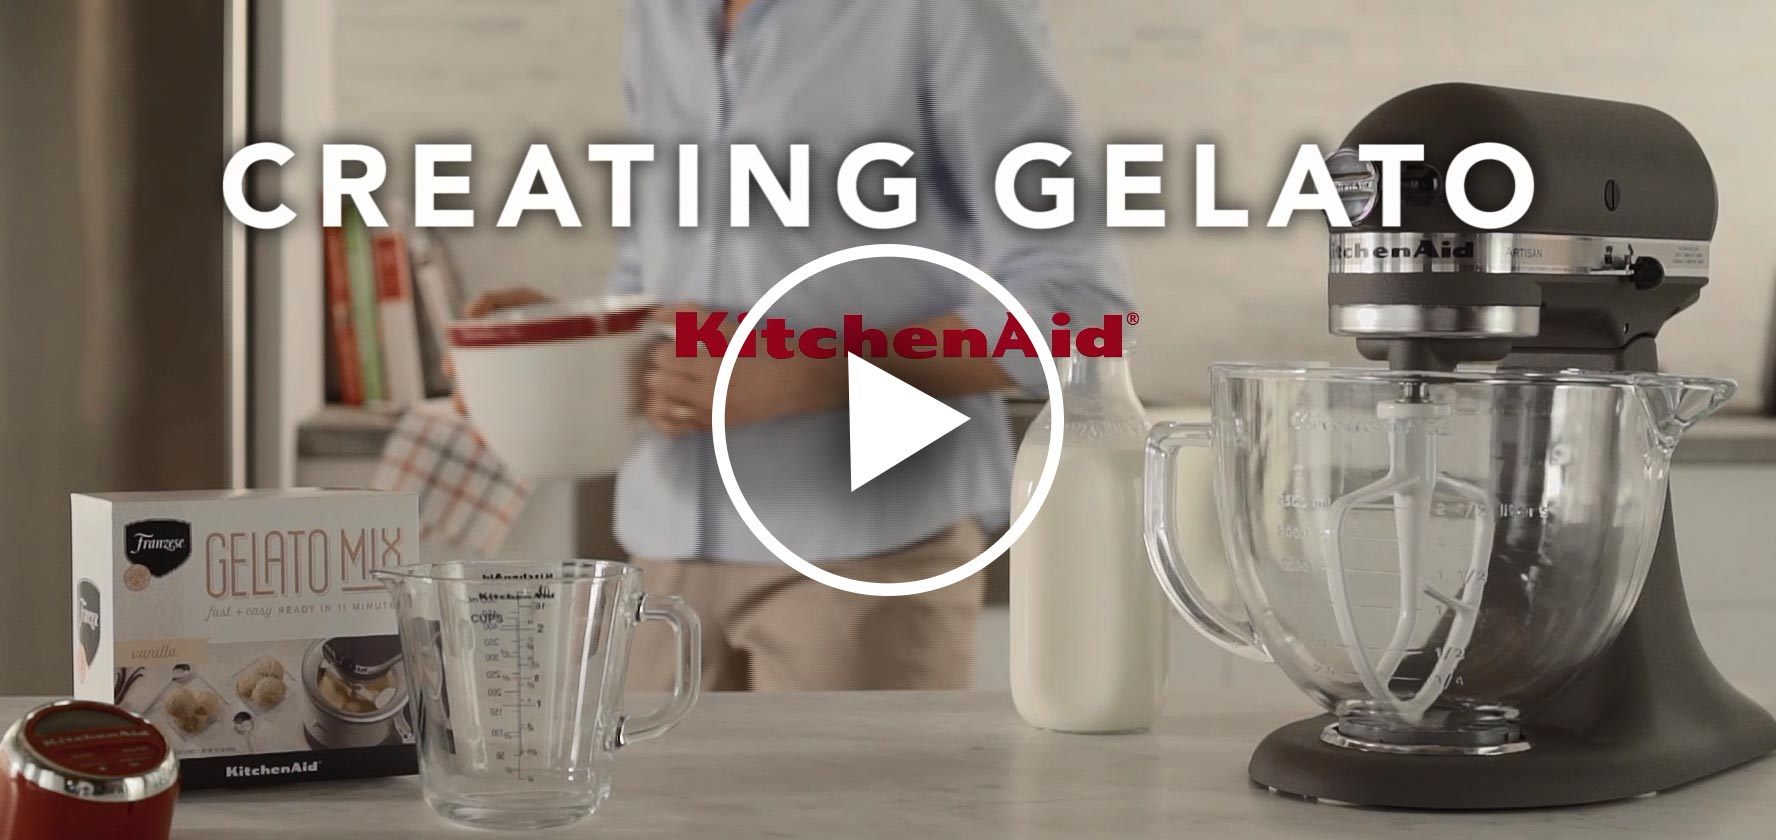 How To Make Gelato In Kitchen Aid